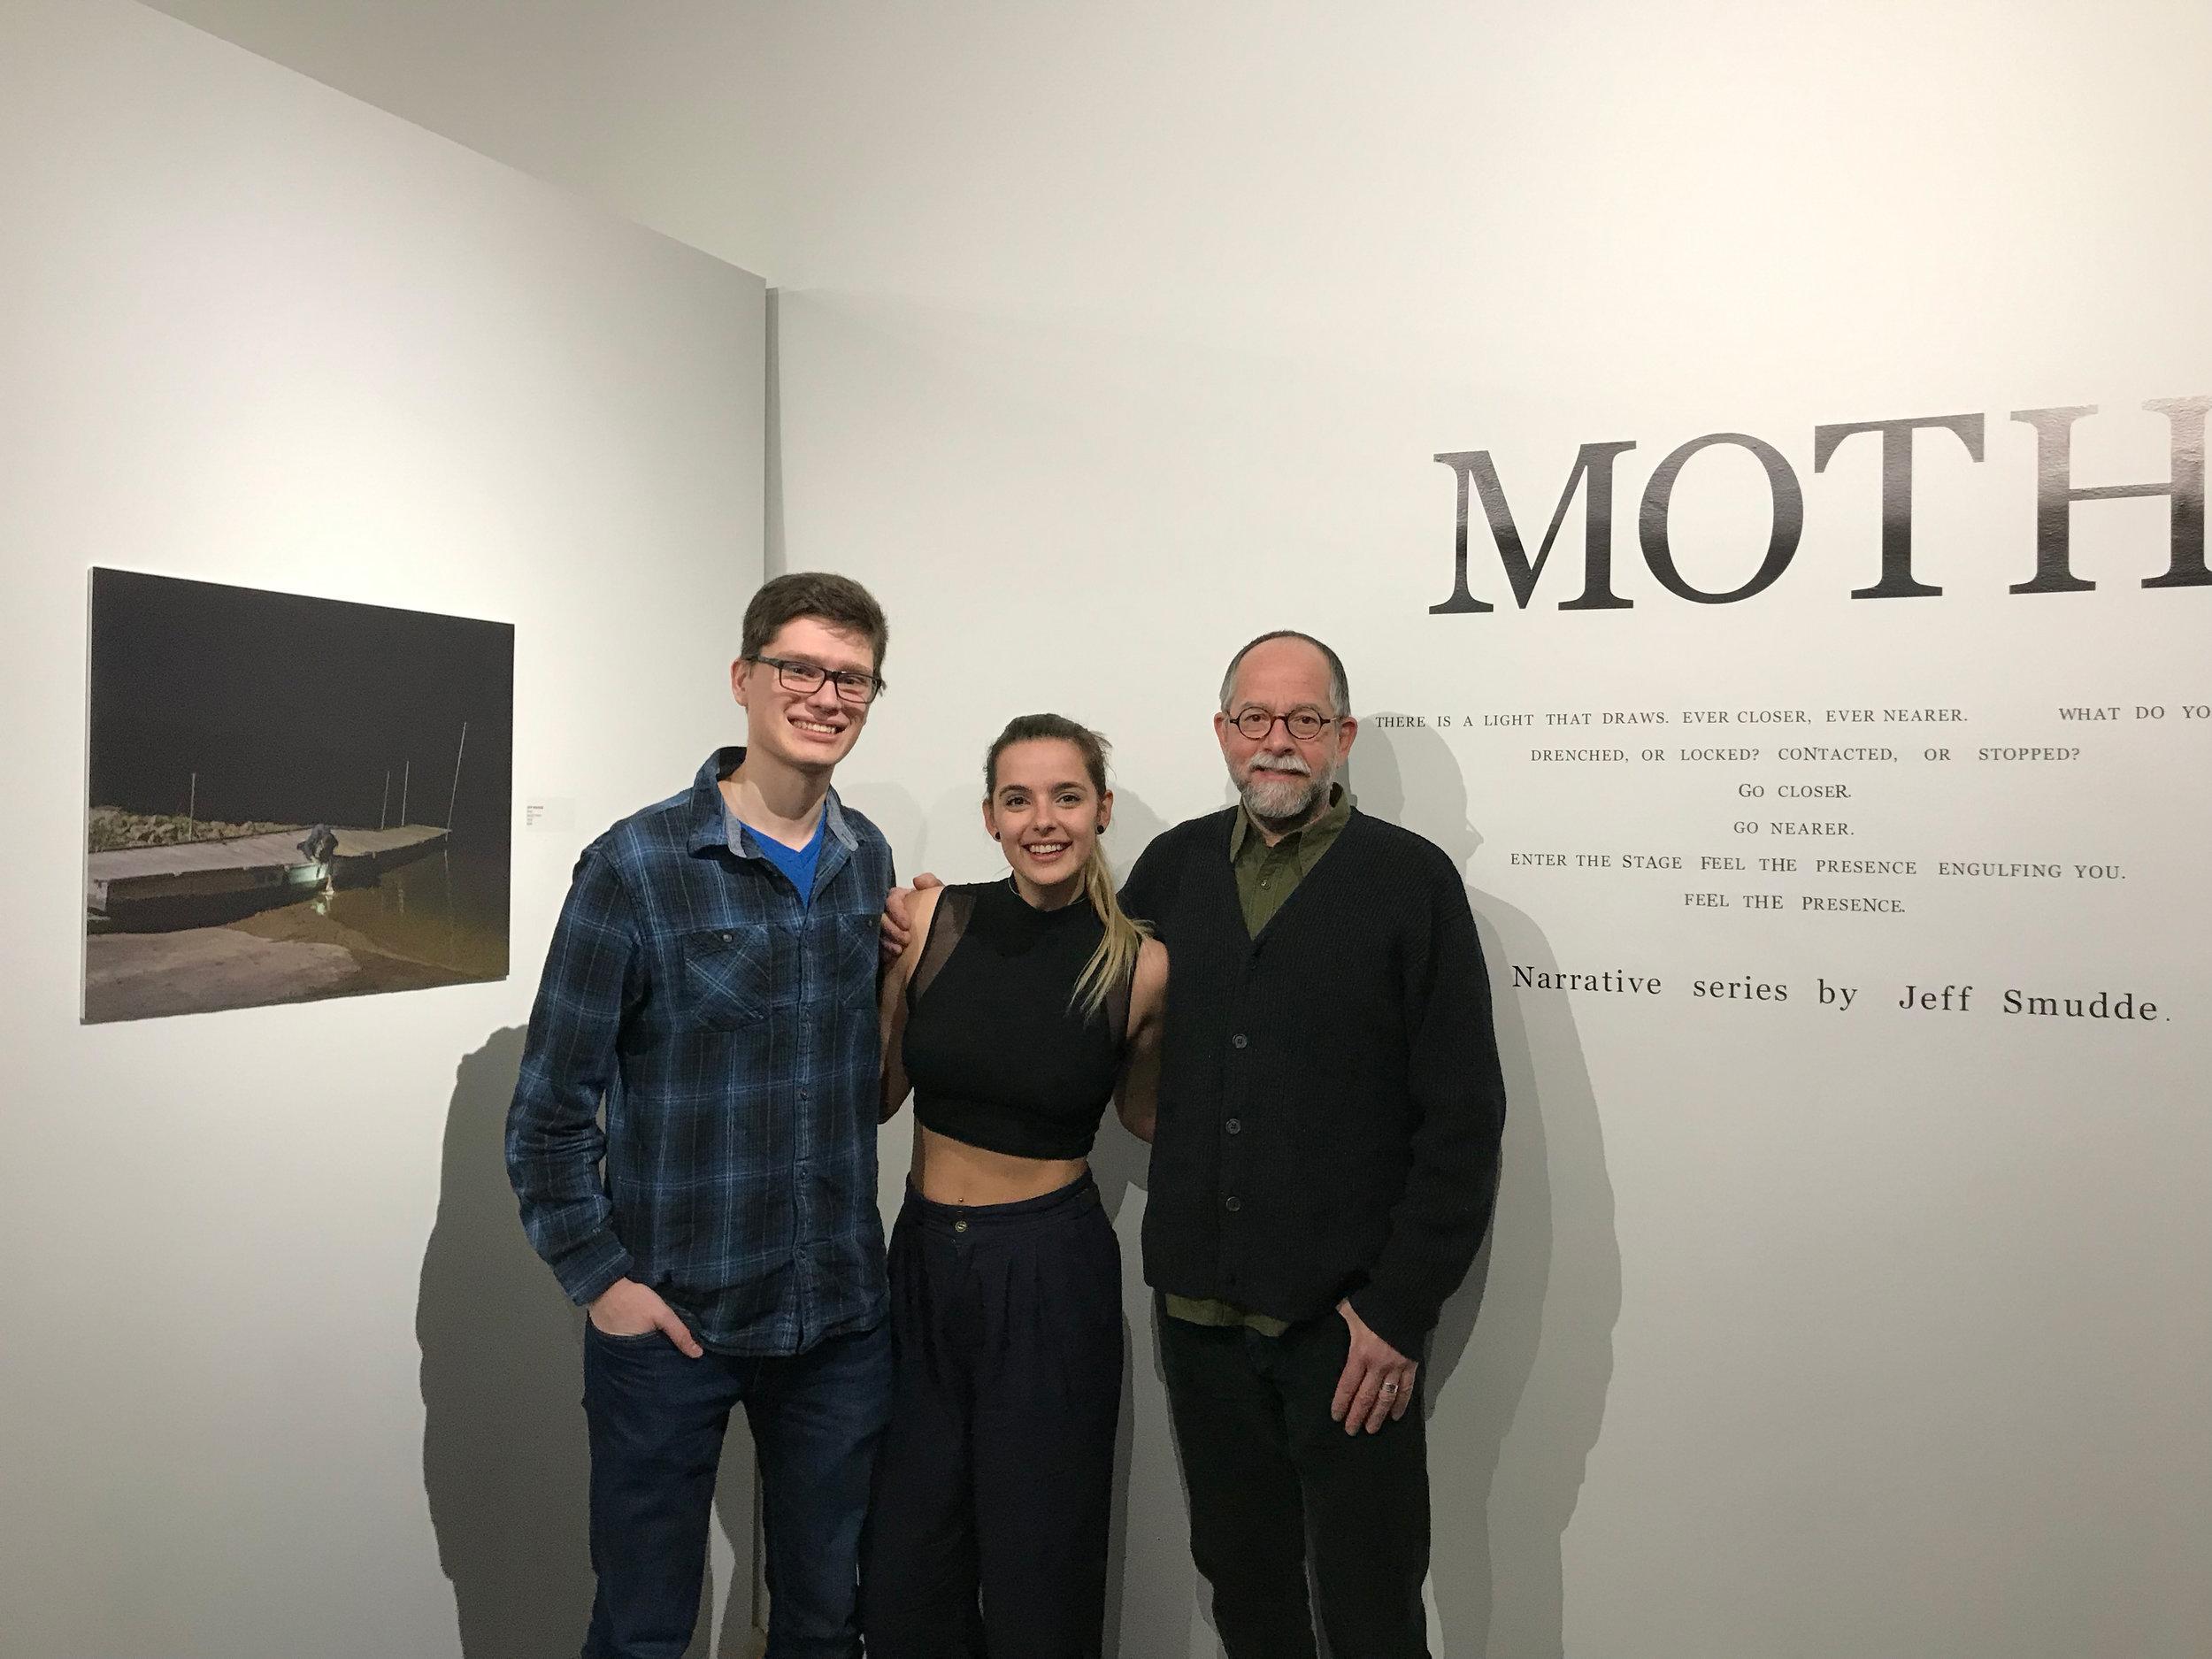 Myself, Izabela Batko, and Bill O'Donnell